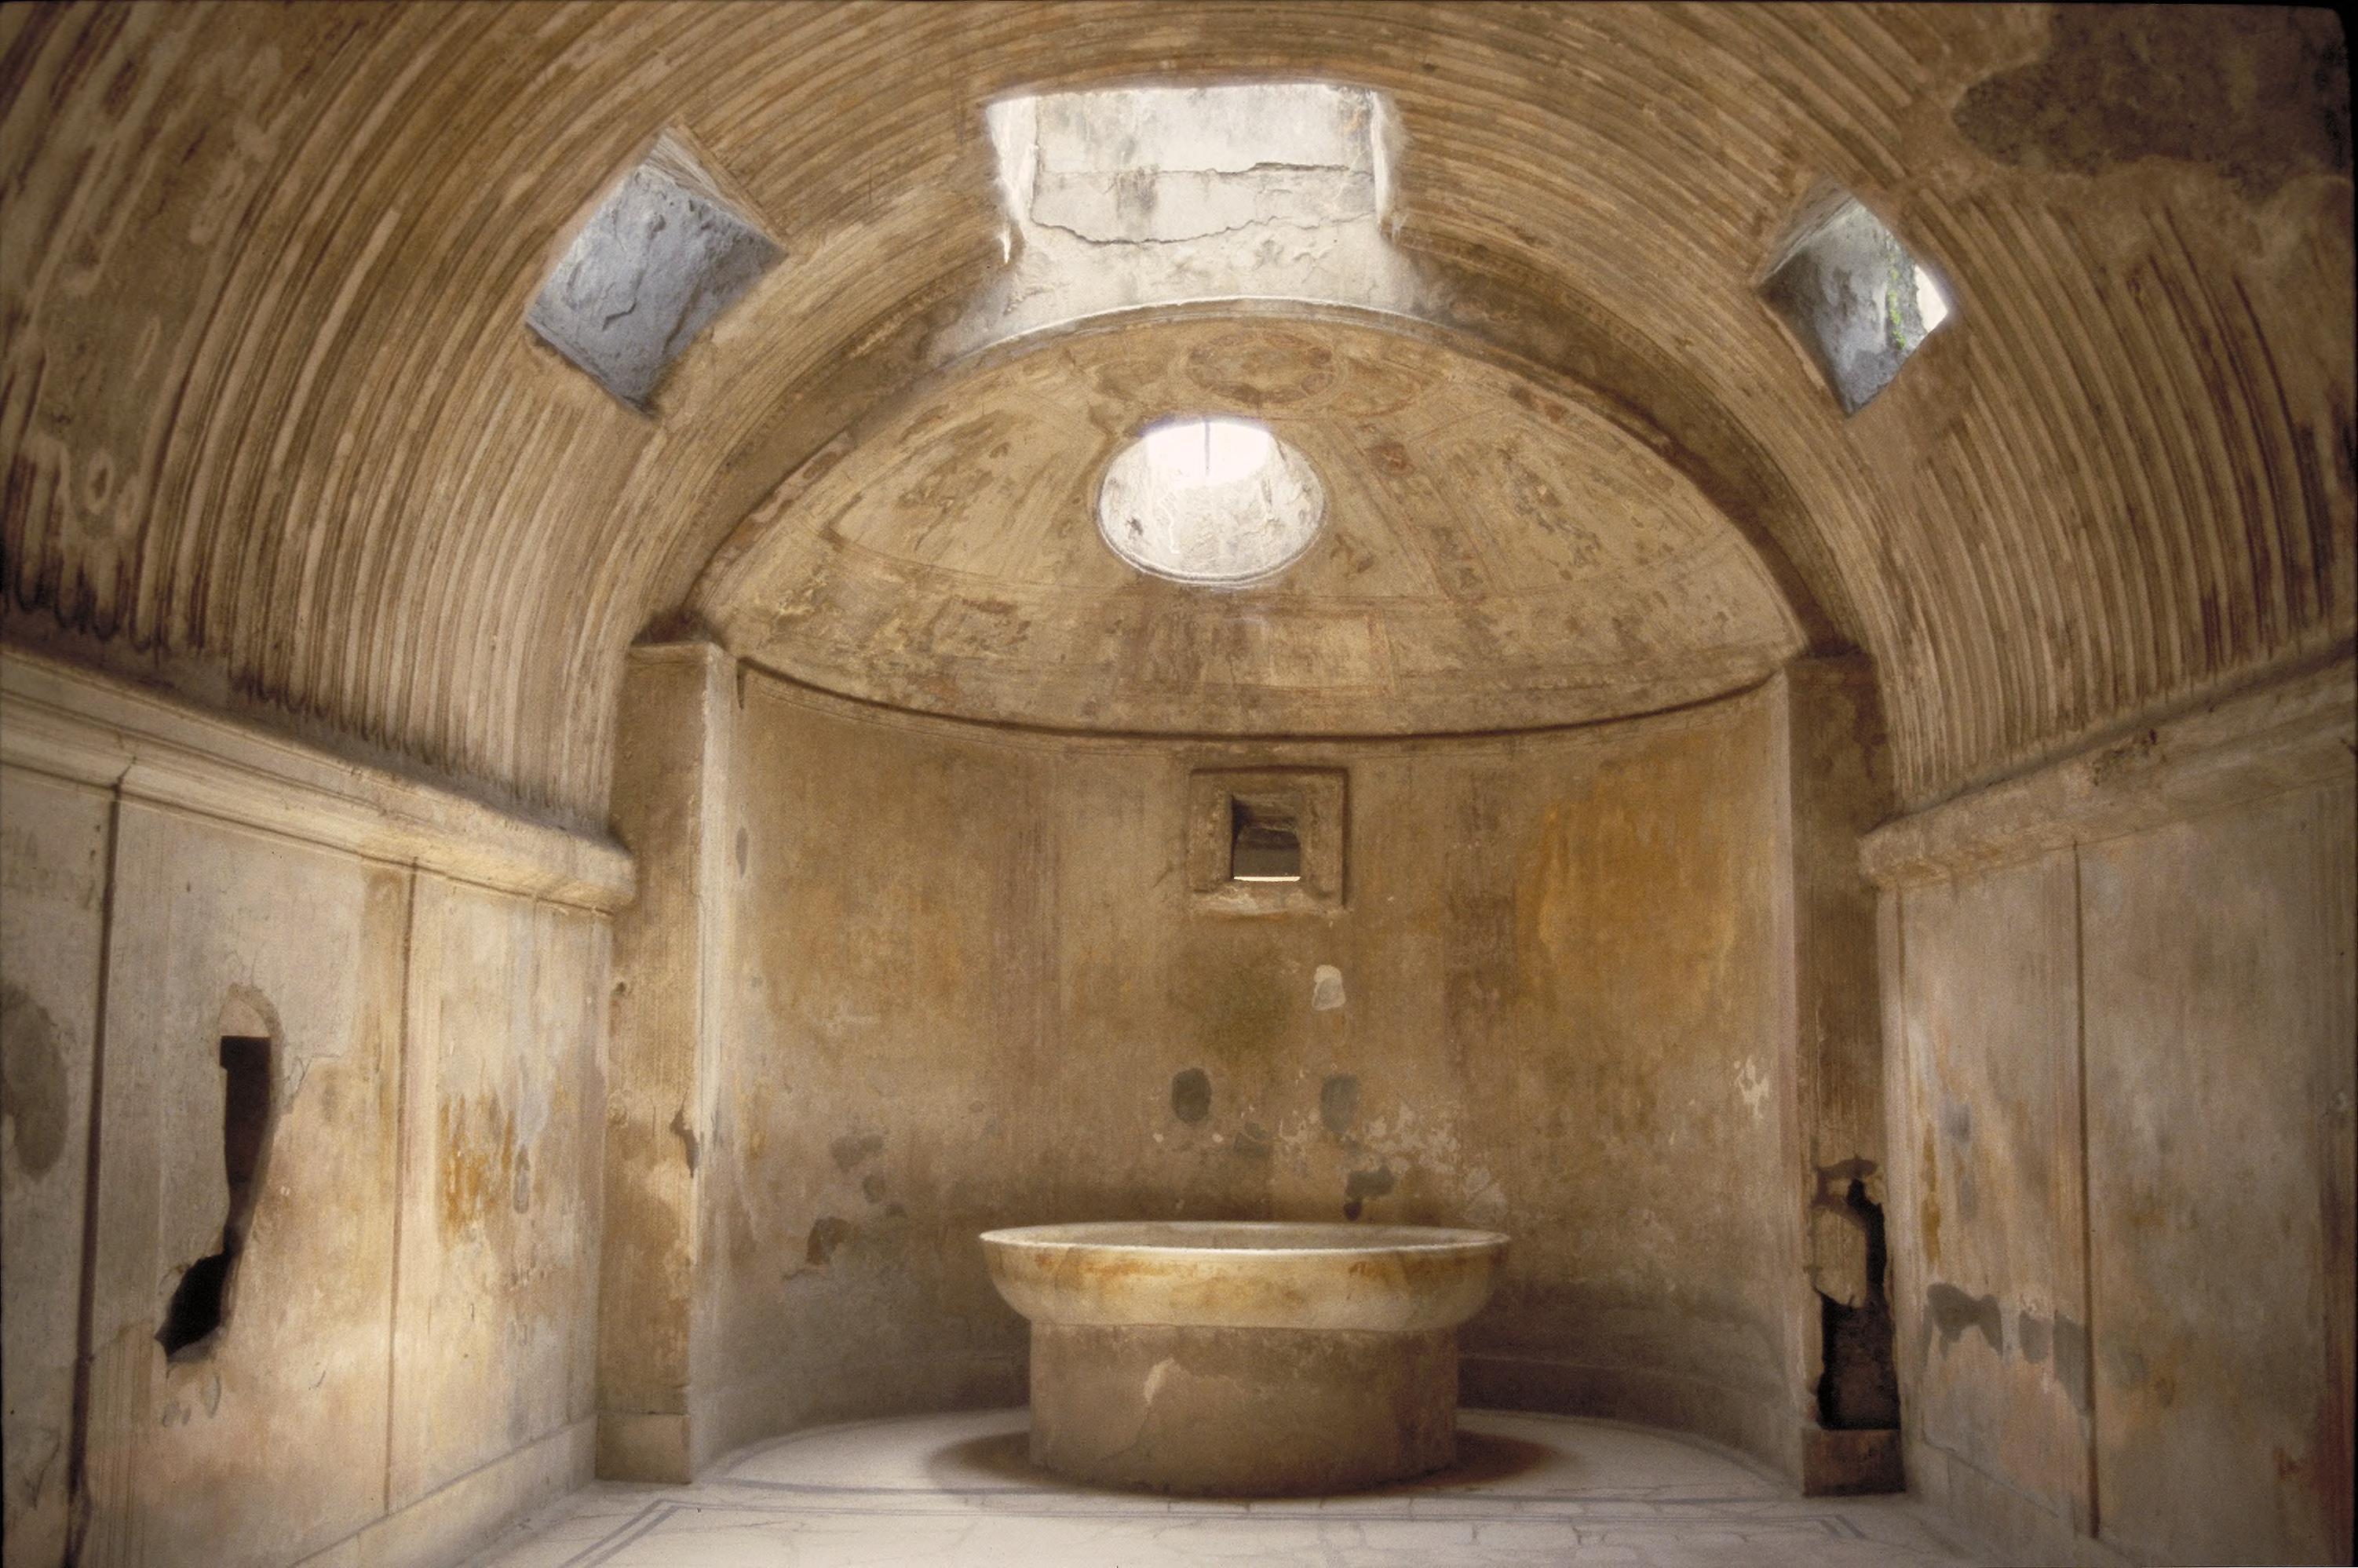 Art Images for College Teaching: Forum Baths, Pompeii: interior of ...